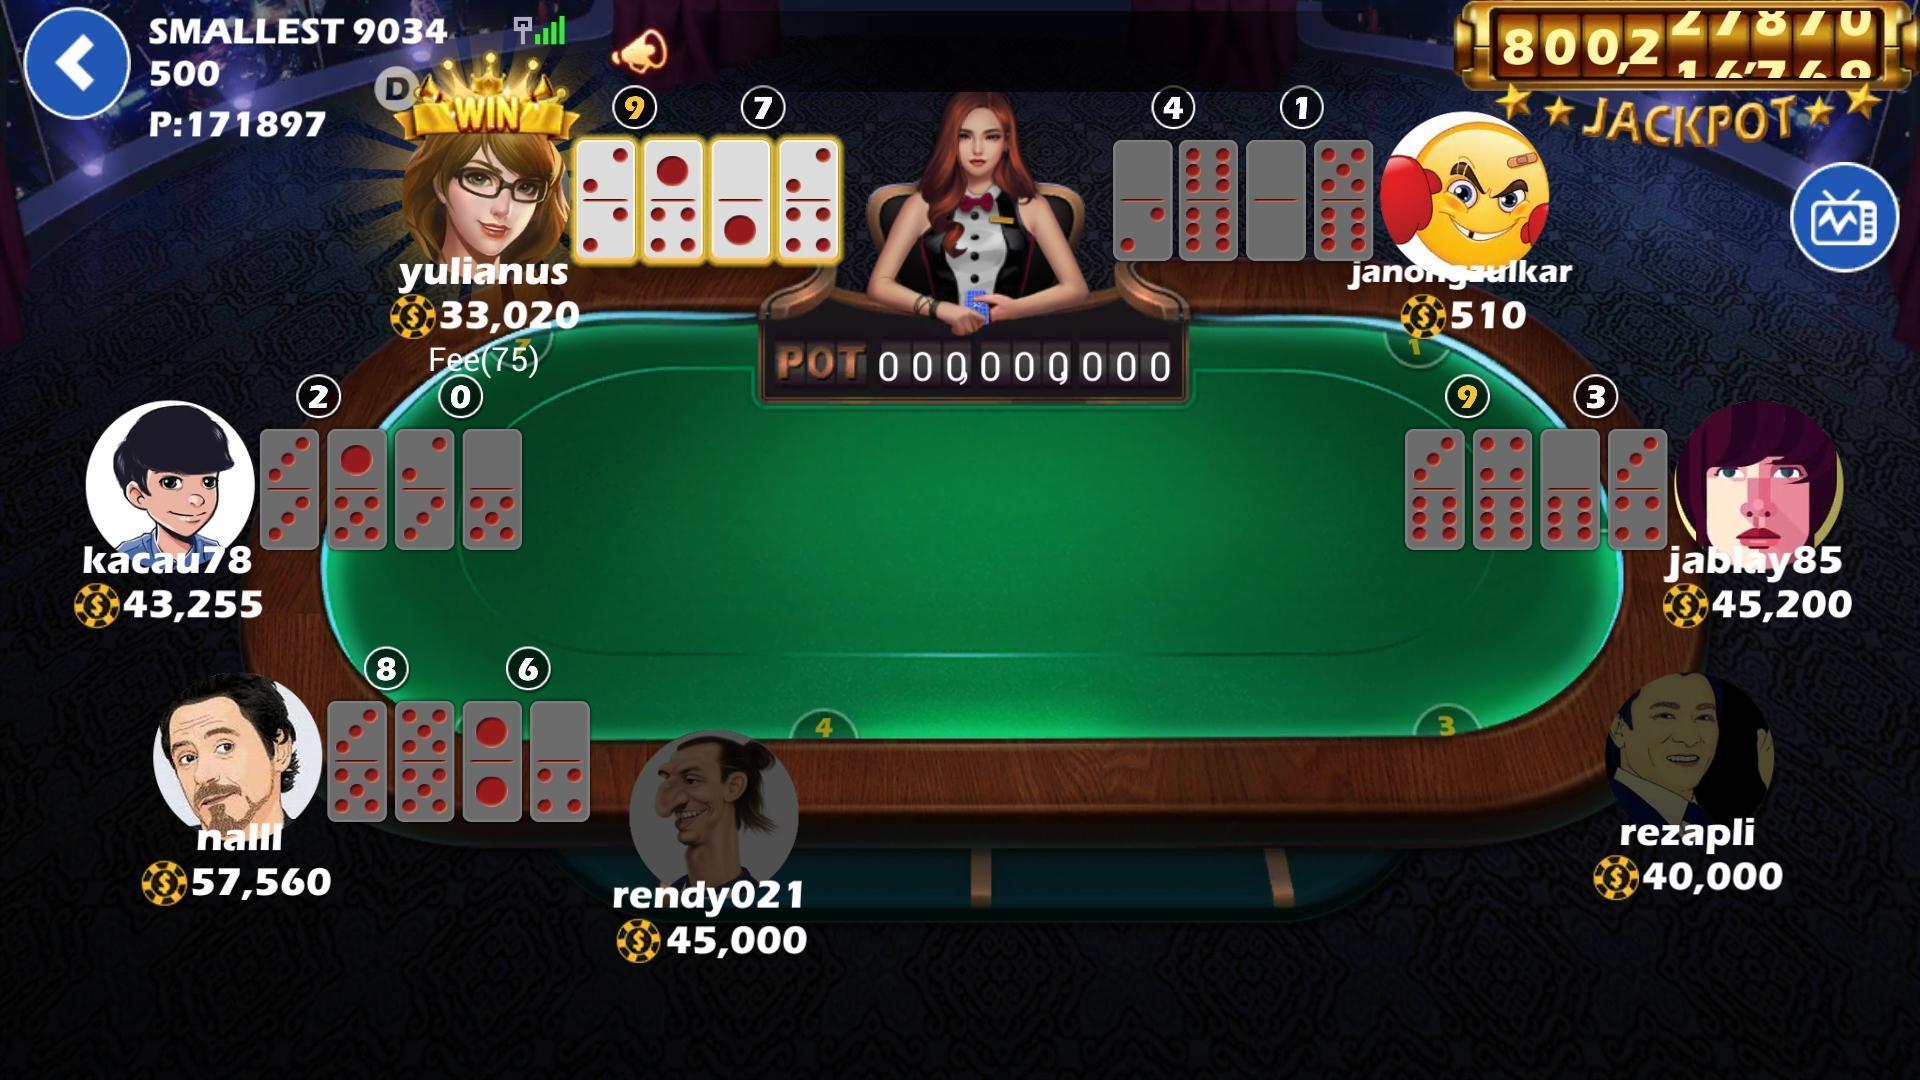 Domino Qiuqiu Keunggulan Game Ini Wajib Anda Tahu Rahasiatekno